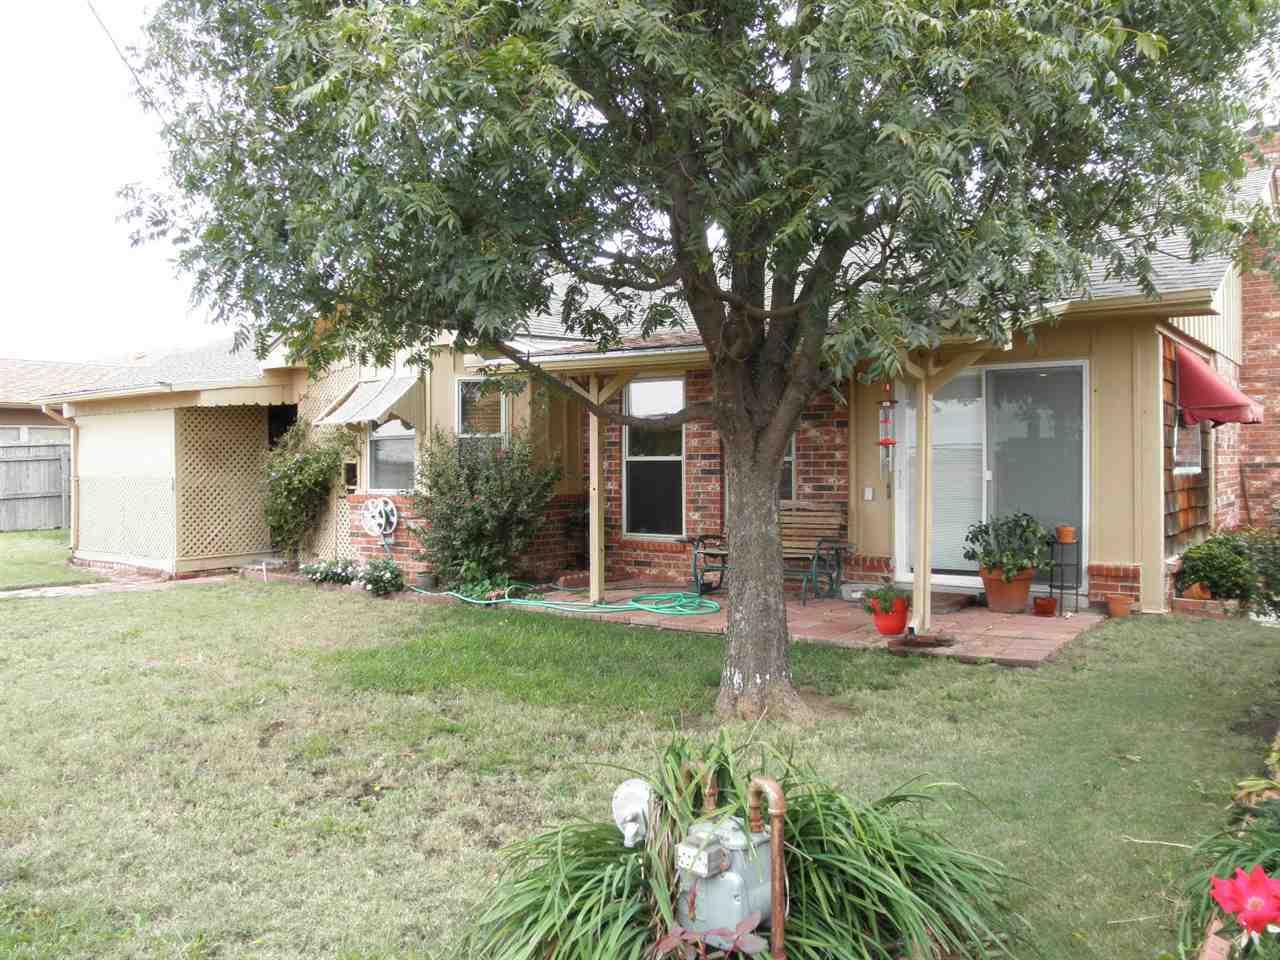 Sold Cross Sale W/ MLS | 2516 Oriole  Ponca City, OK 74601 23